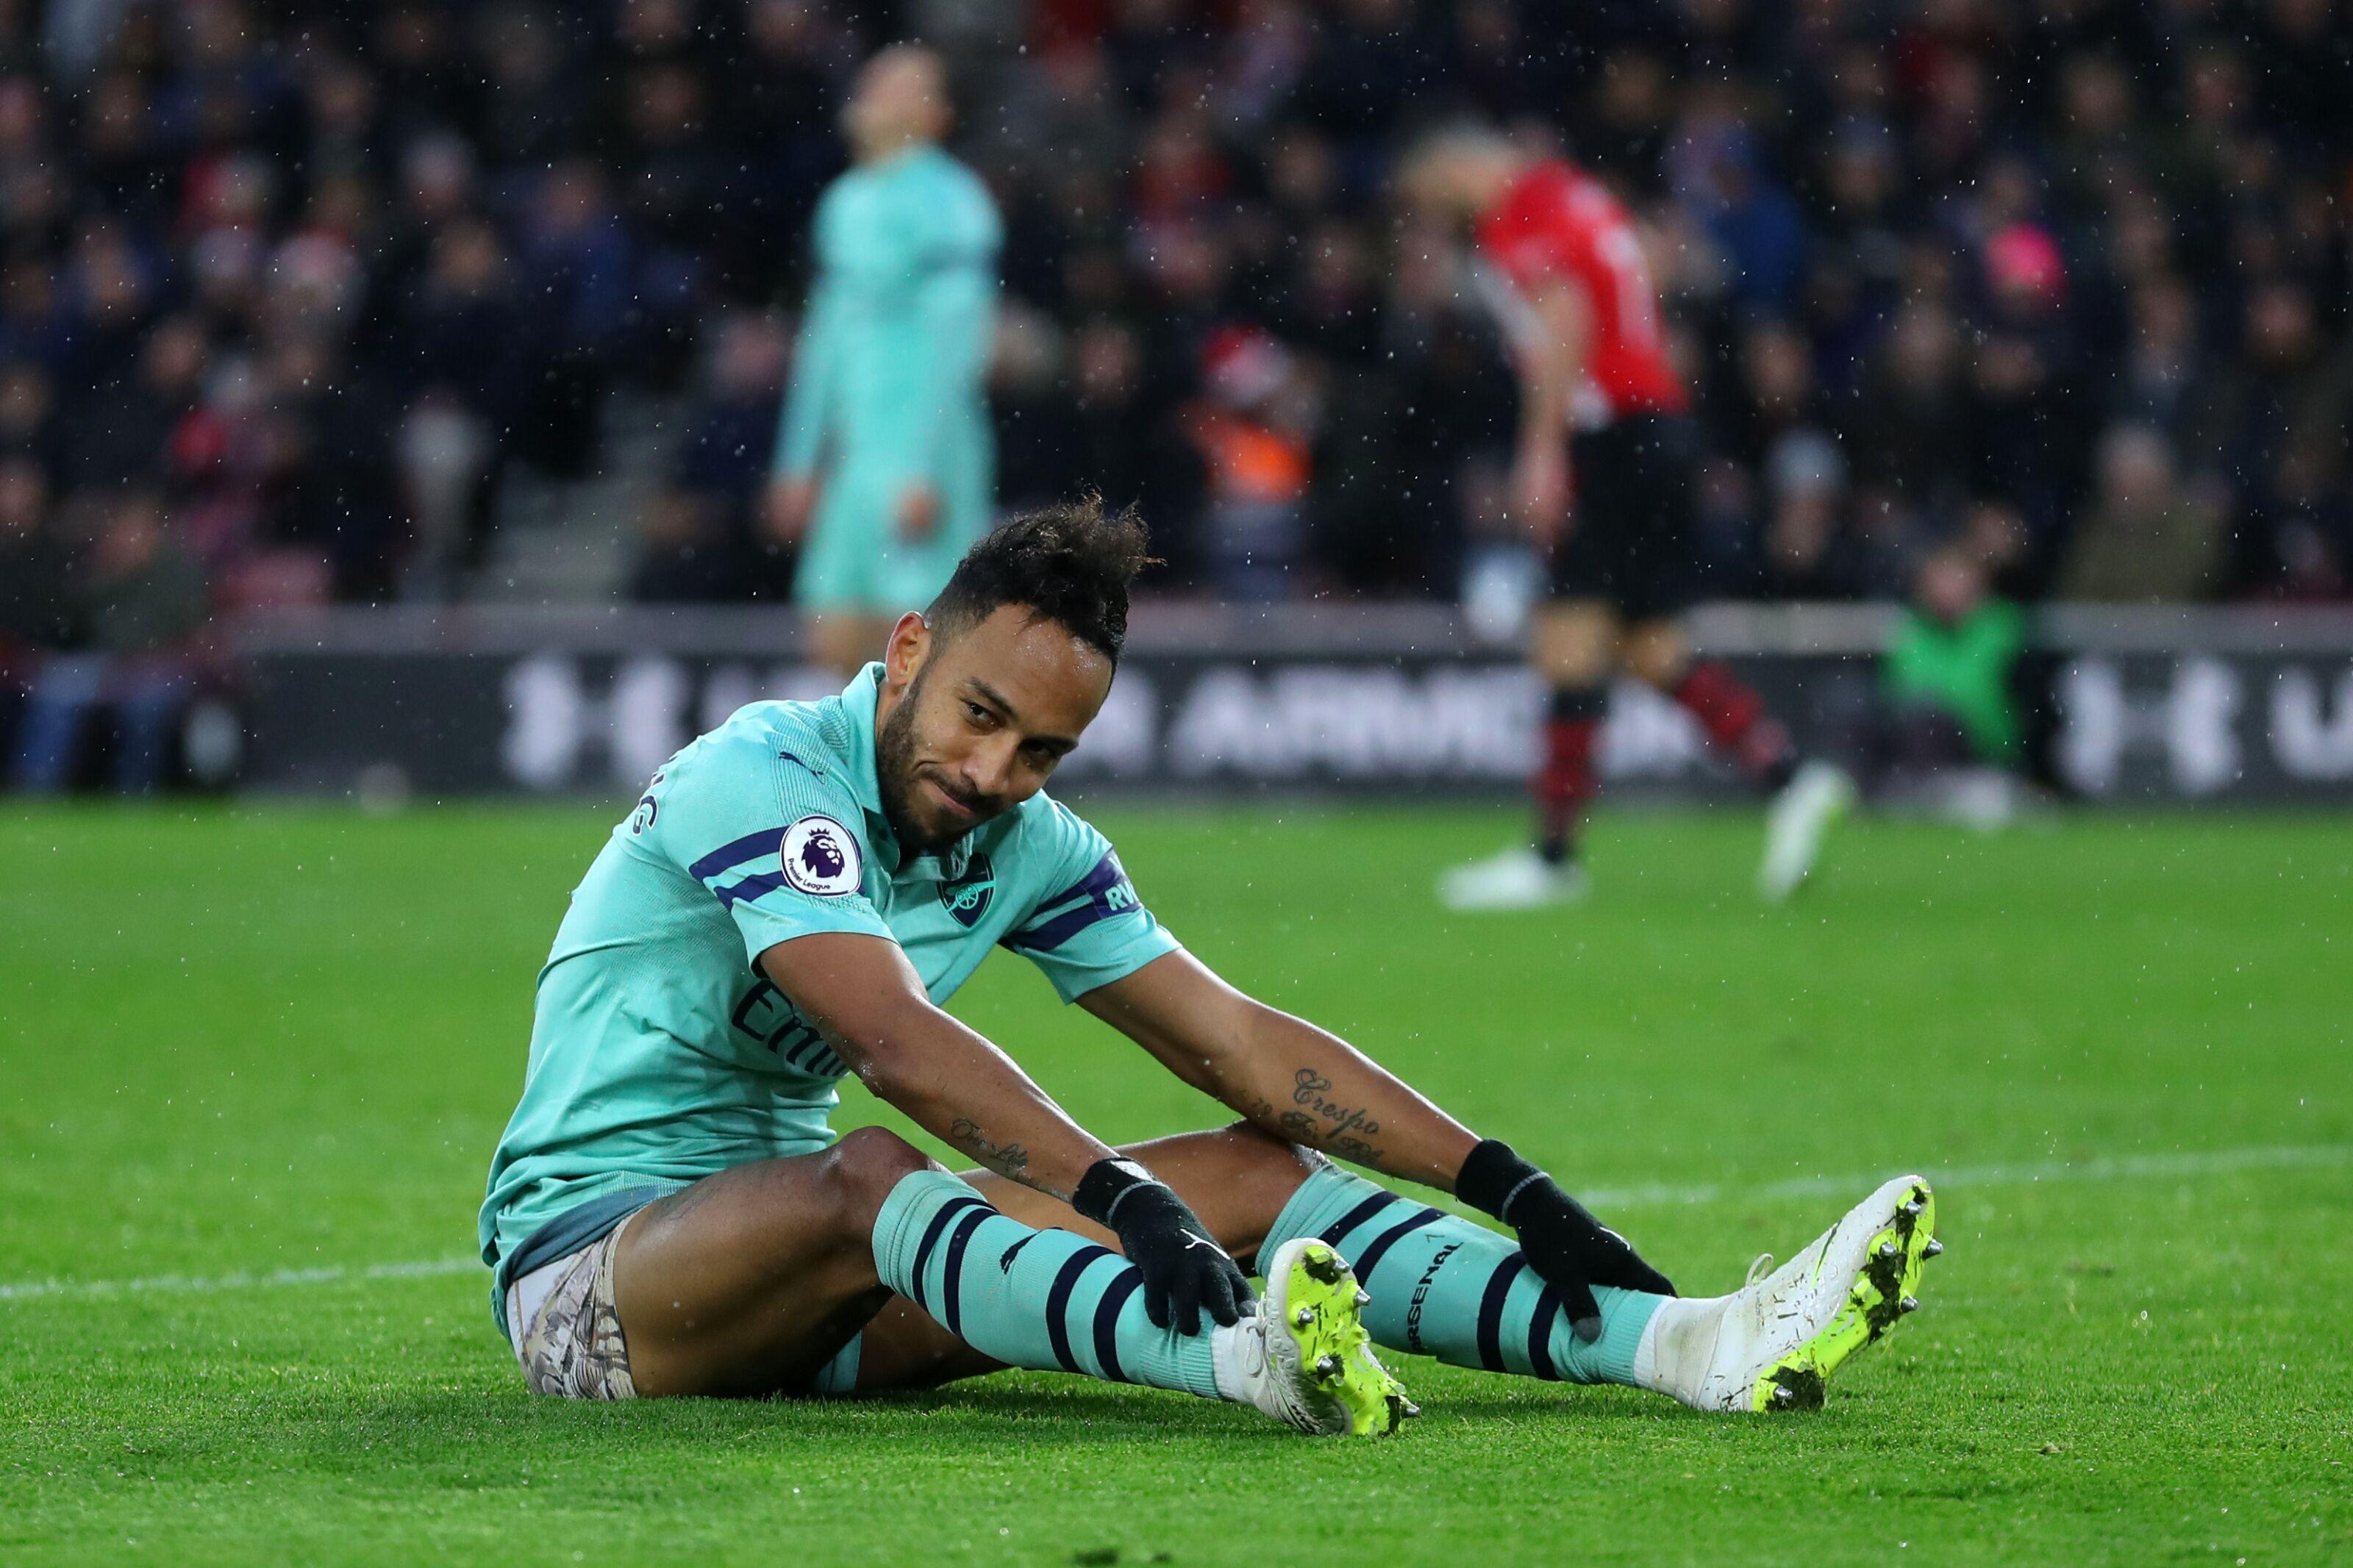 Arsenal vs Southampton player ratings: Well, that sucks ...